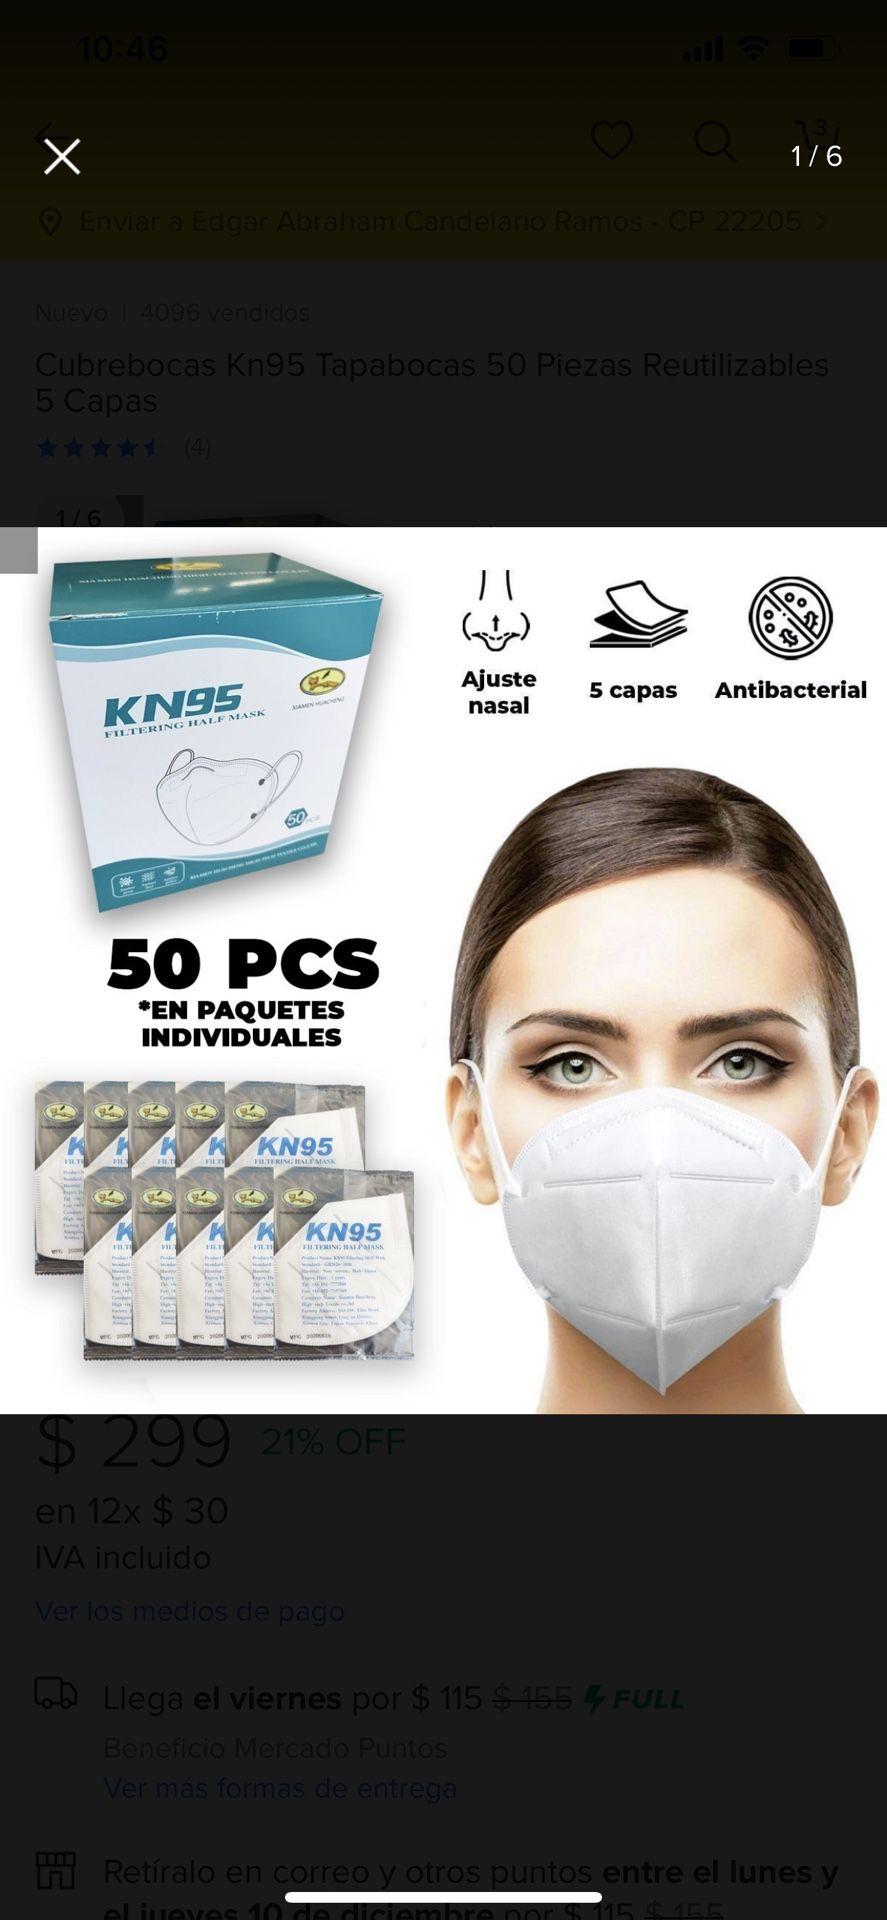 Face mask 50 for 5 dlls